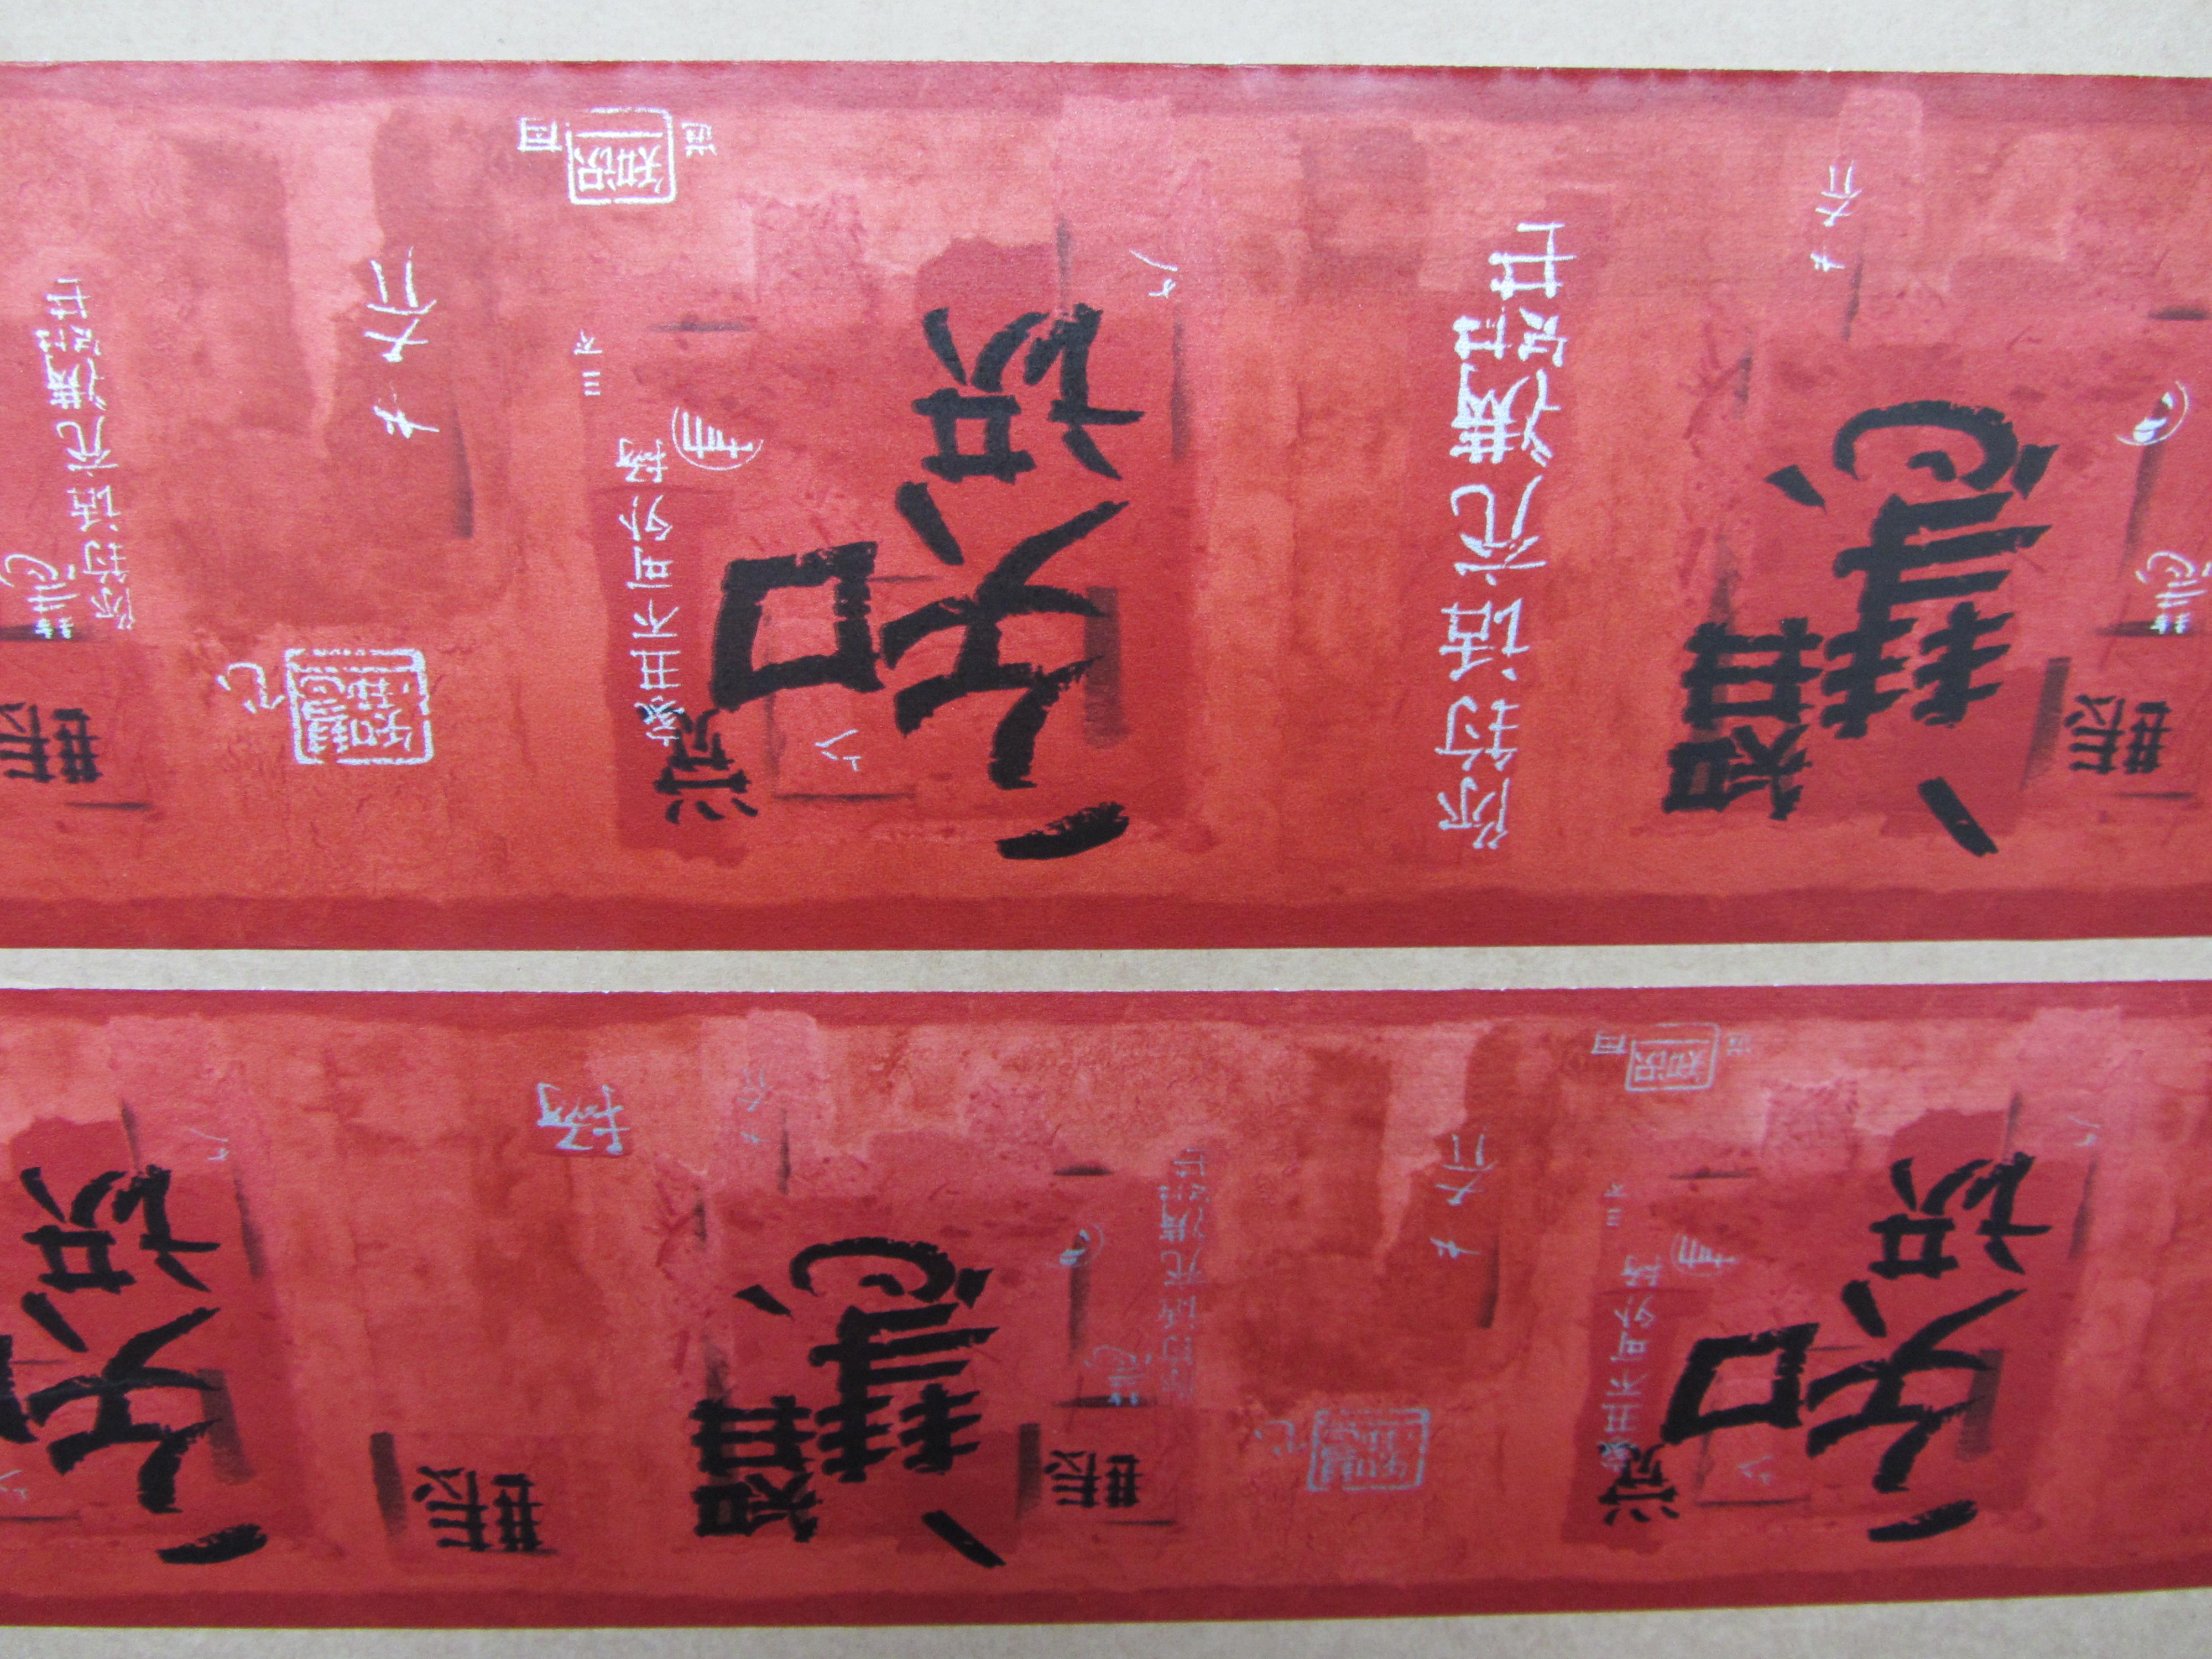 ORIENTAL RED WALLPAPER BORDER SELF ADHESIVE BEDROOM HALLWAY LOUNGE 5M 4000x3000